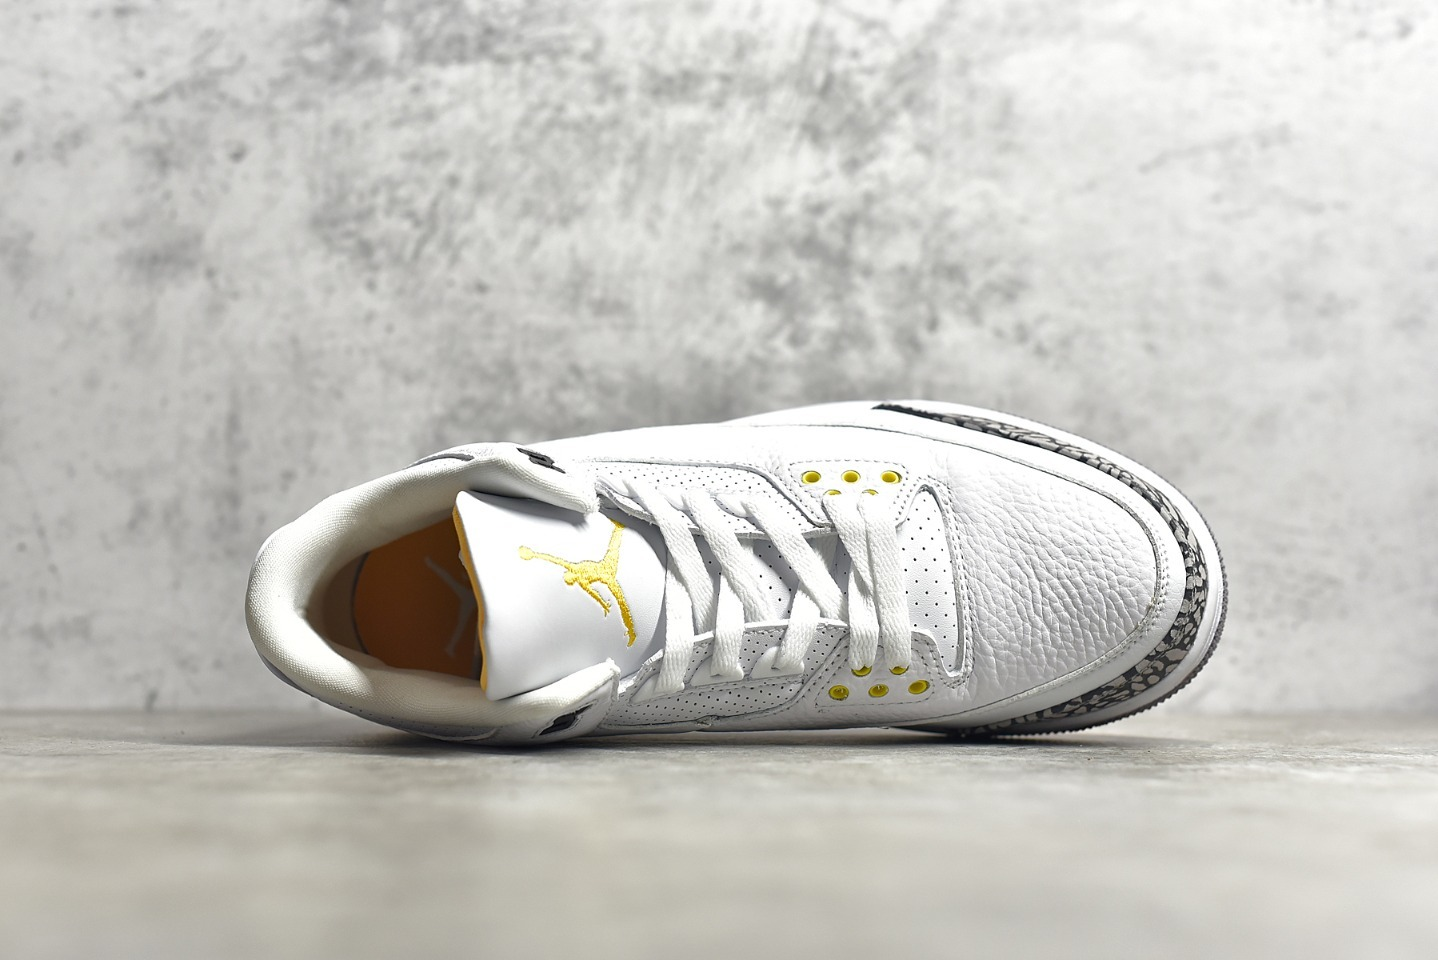 "AJ3湖人白金色 Air Jordan 3 Retro ""Laser Orange""湖人 AJ3白橙球鞋实战版本 货号:CK9246-108-潮流者之家"